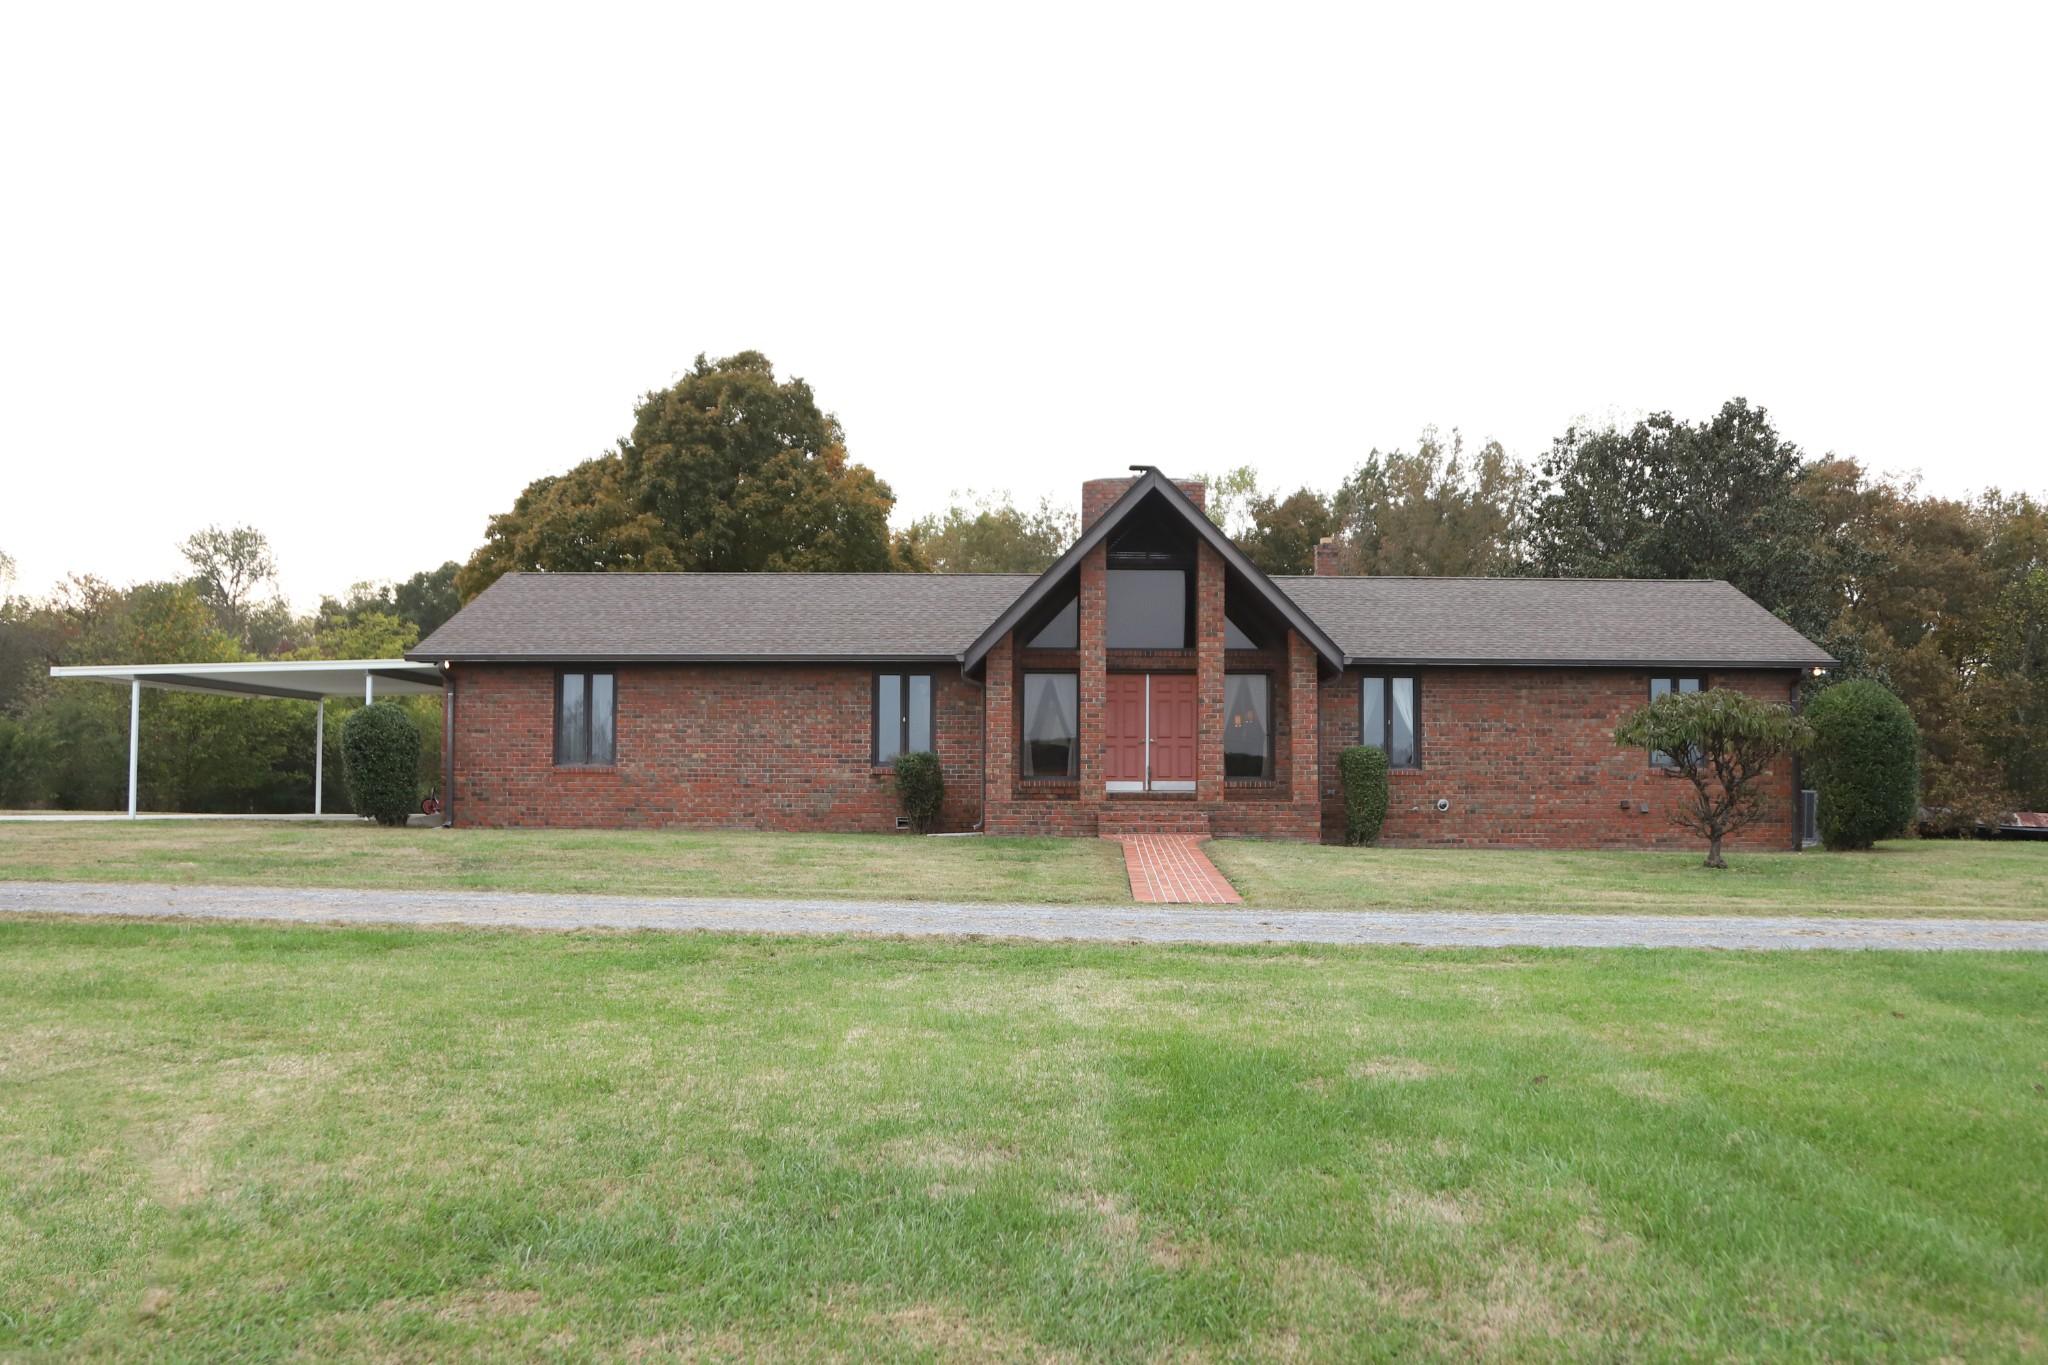 2996 Jacobs Pillar Rd, Smithville, TN 37166 - Smithville, TN real estate listing